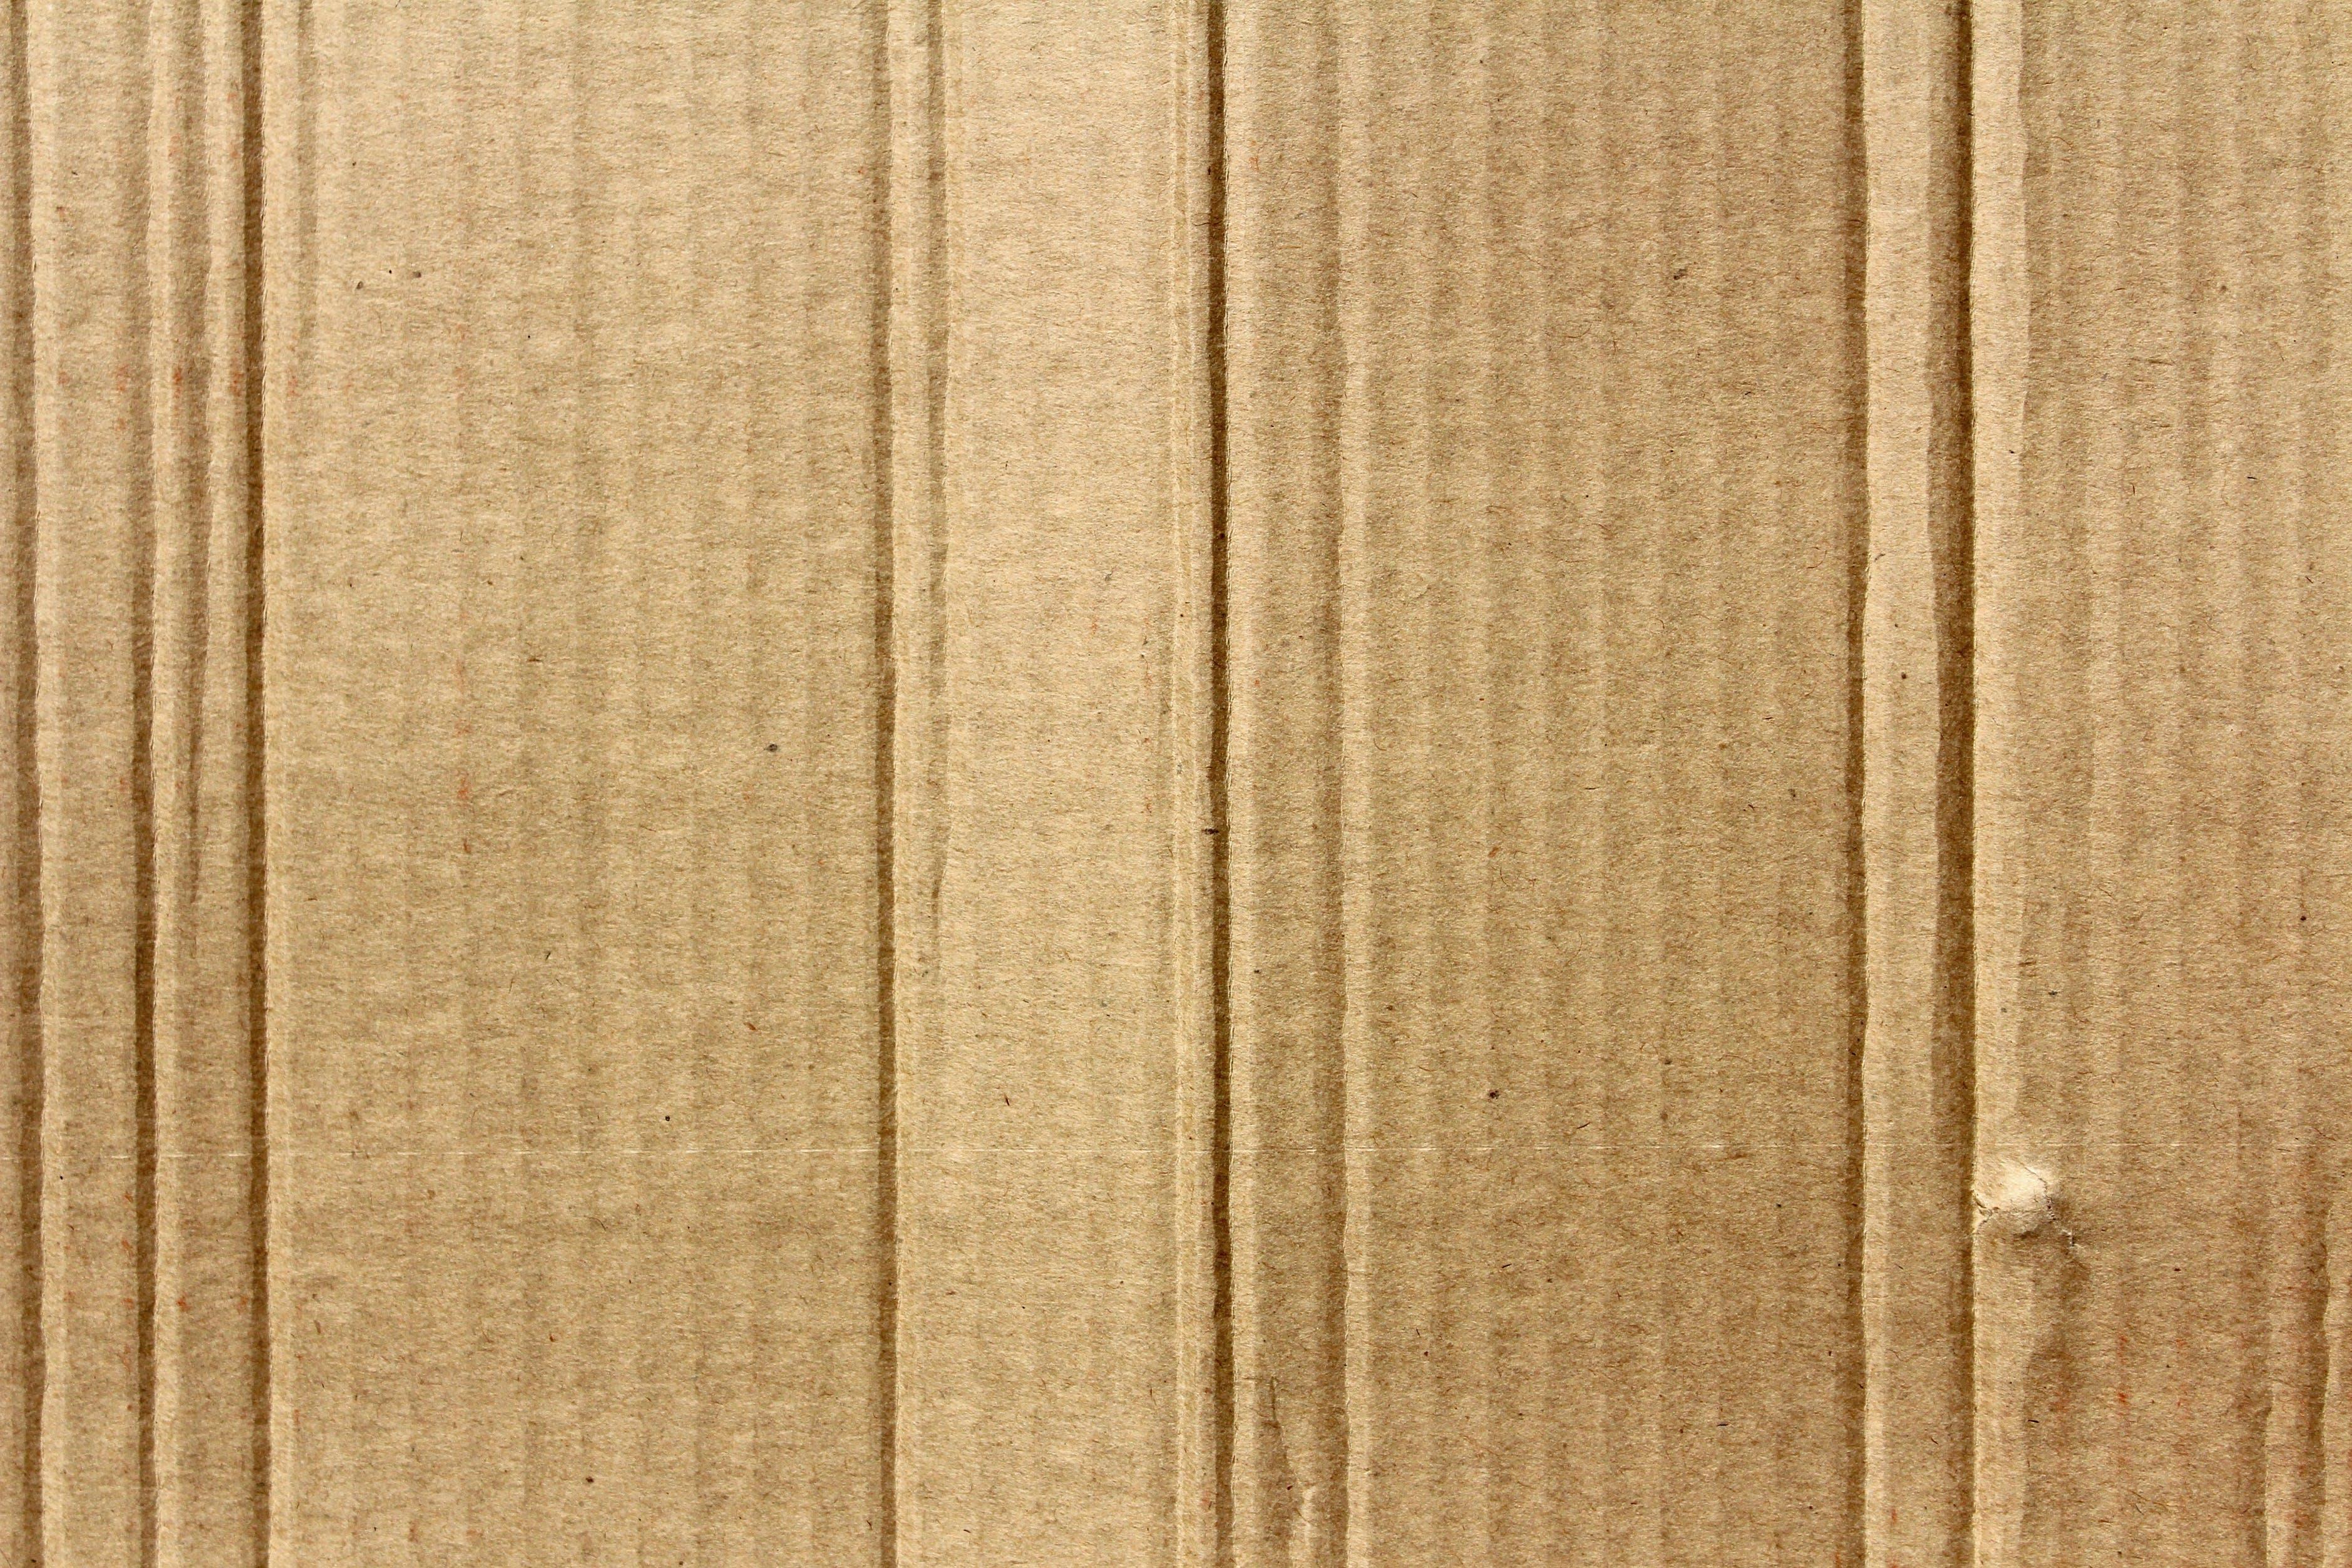 Kostenloses Stock Foto zu braun, gewellt, karton, material